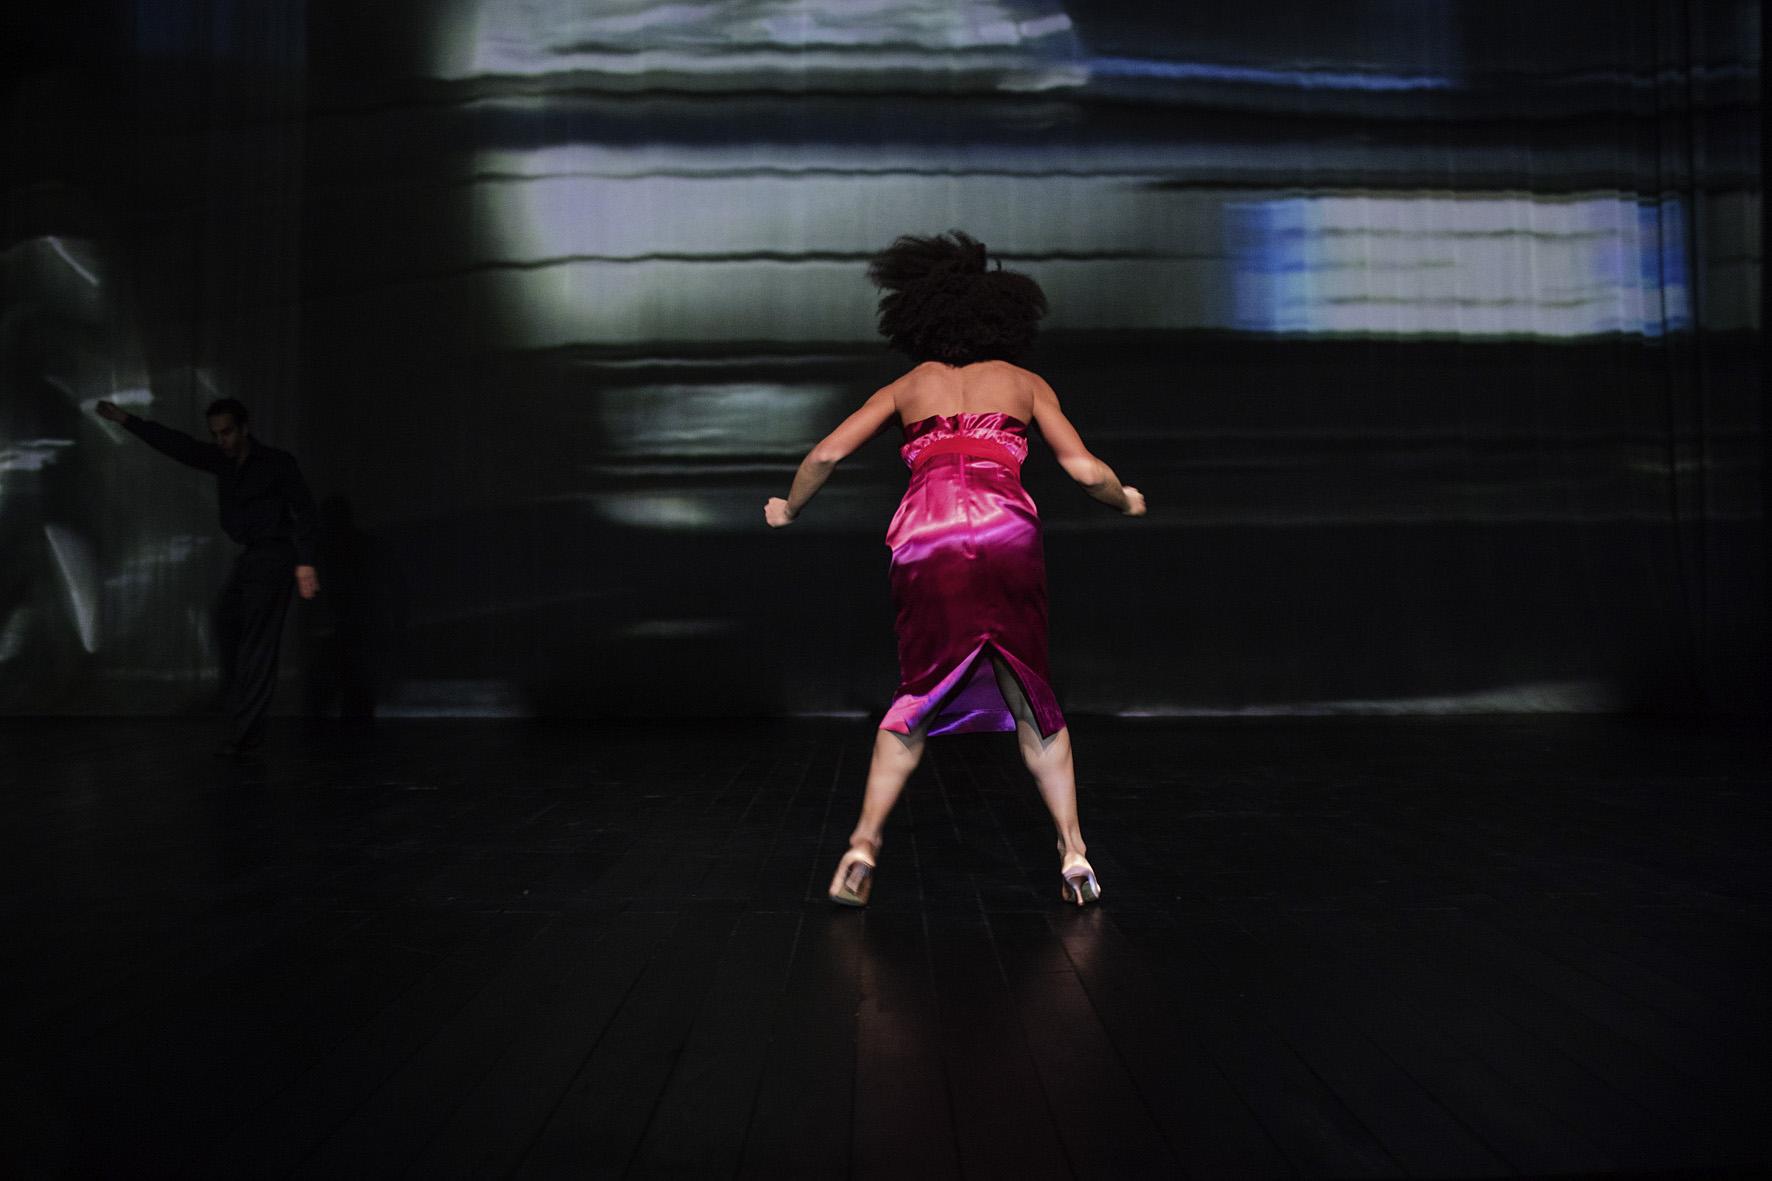 Tanz Film Tanz Kritik Wuppertal